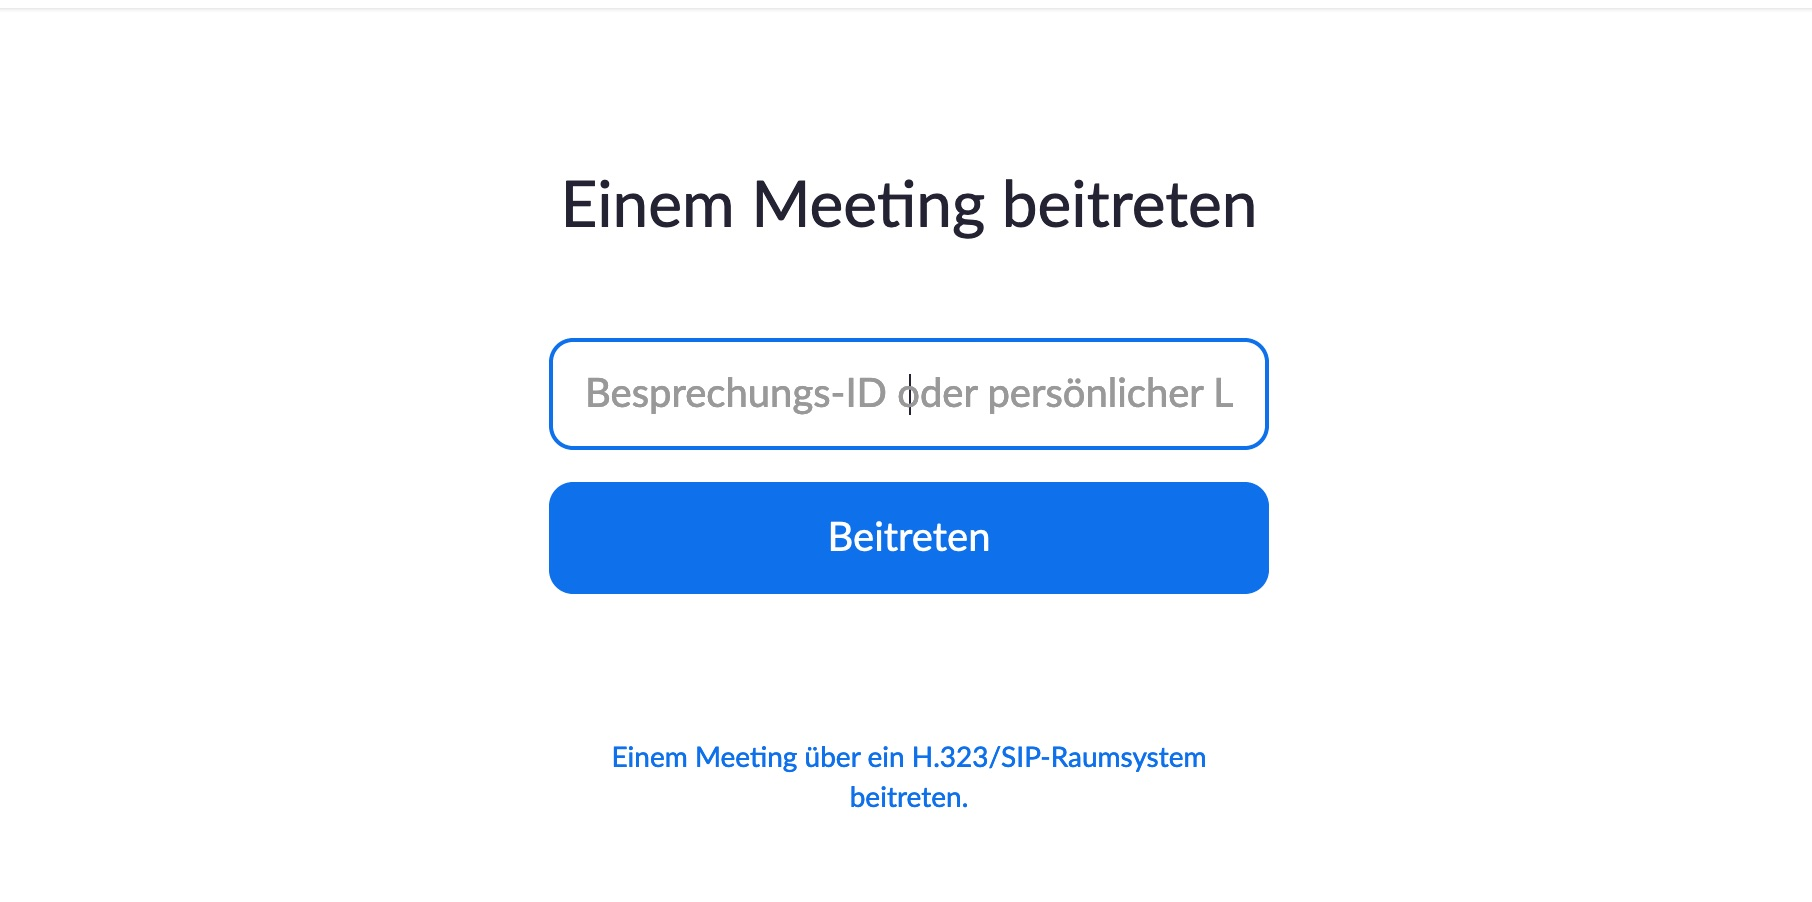 meeting-beitreten_1.jpg